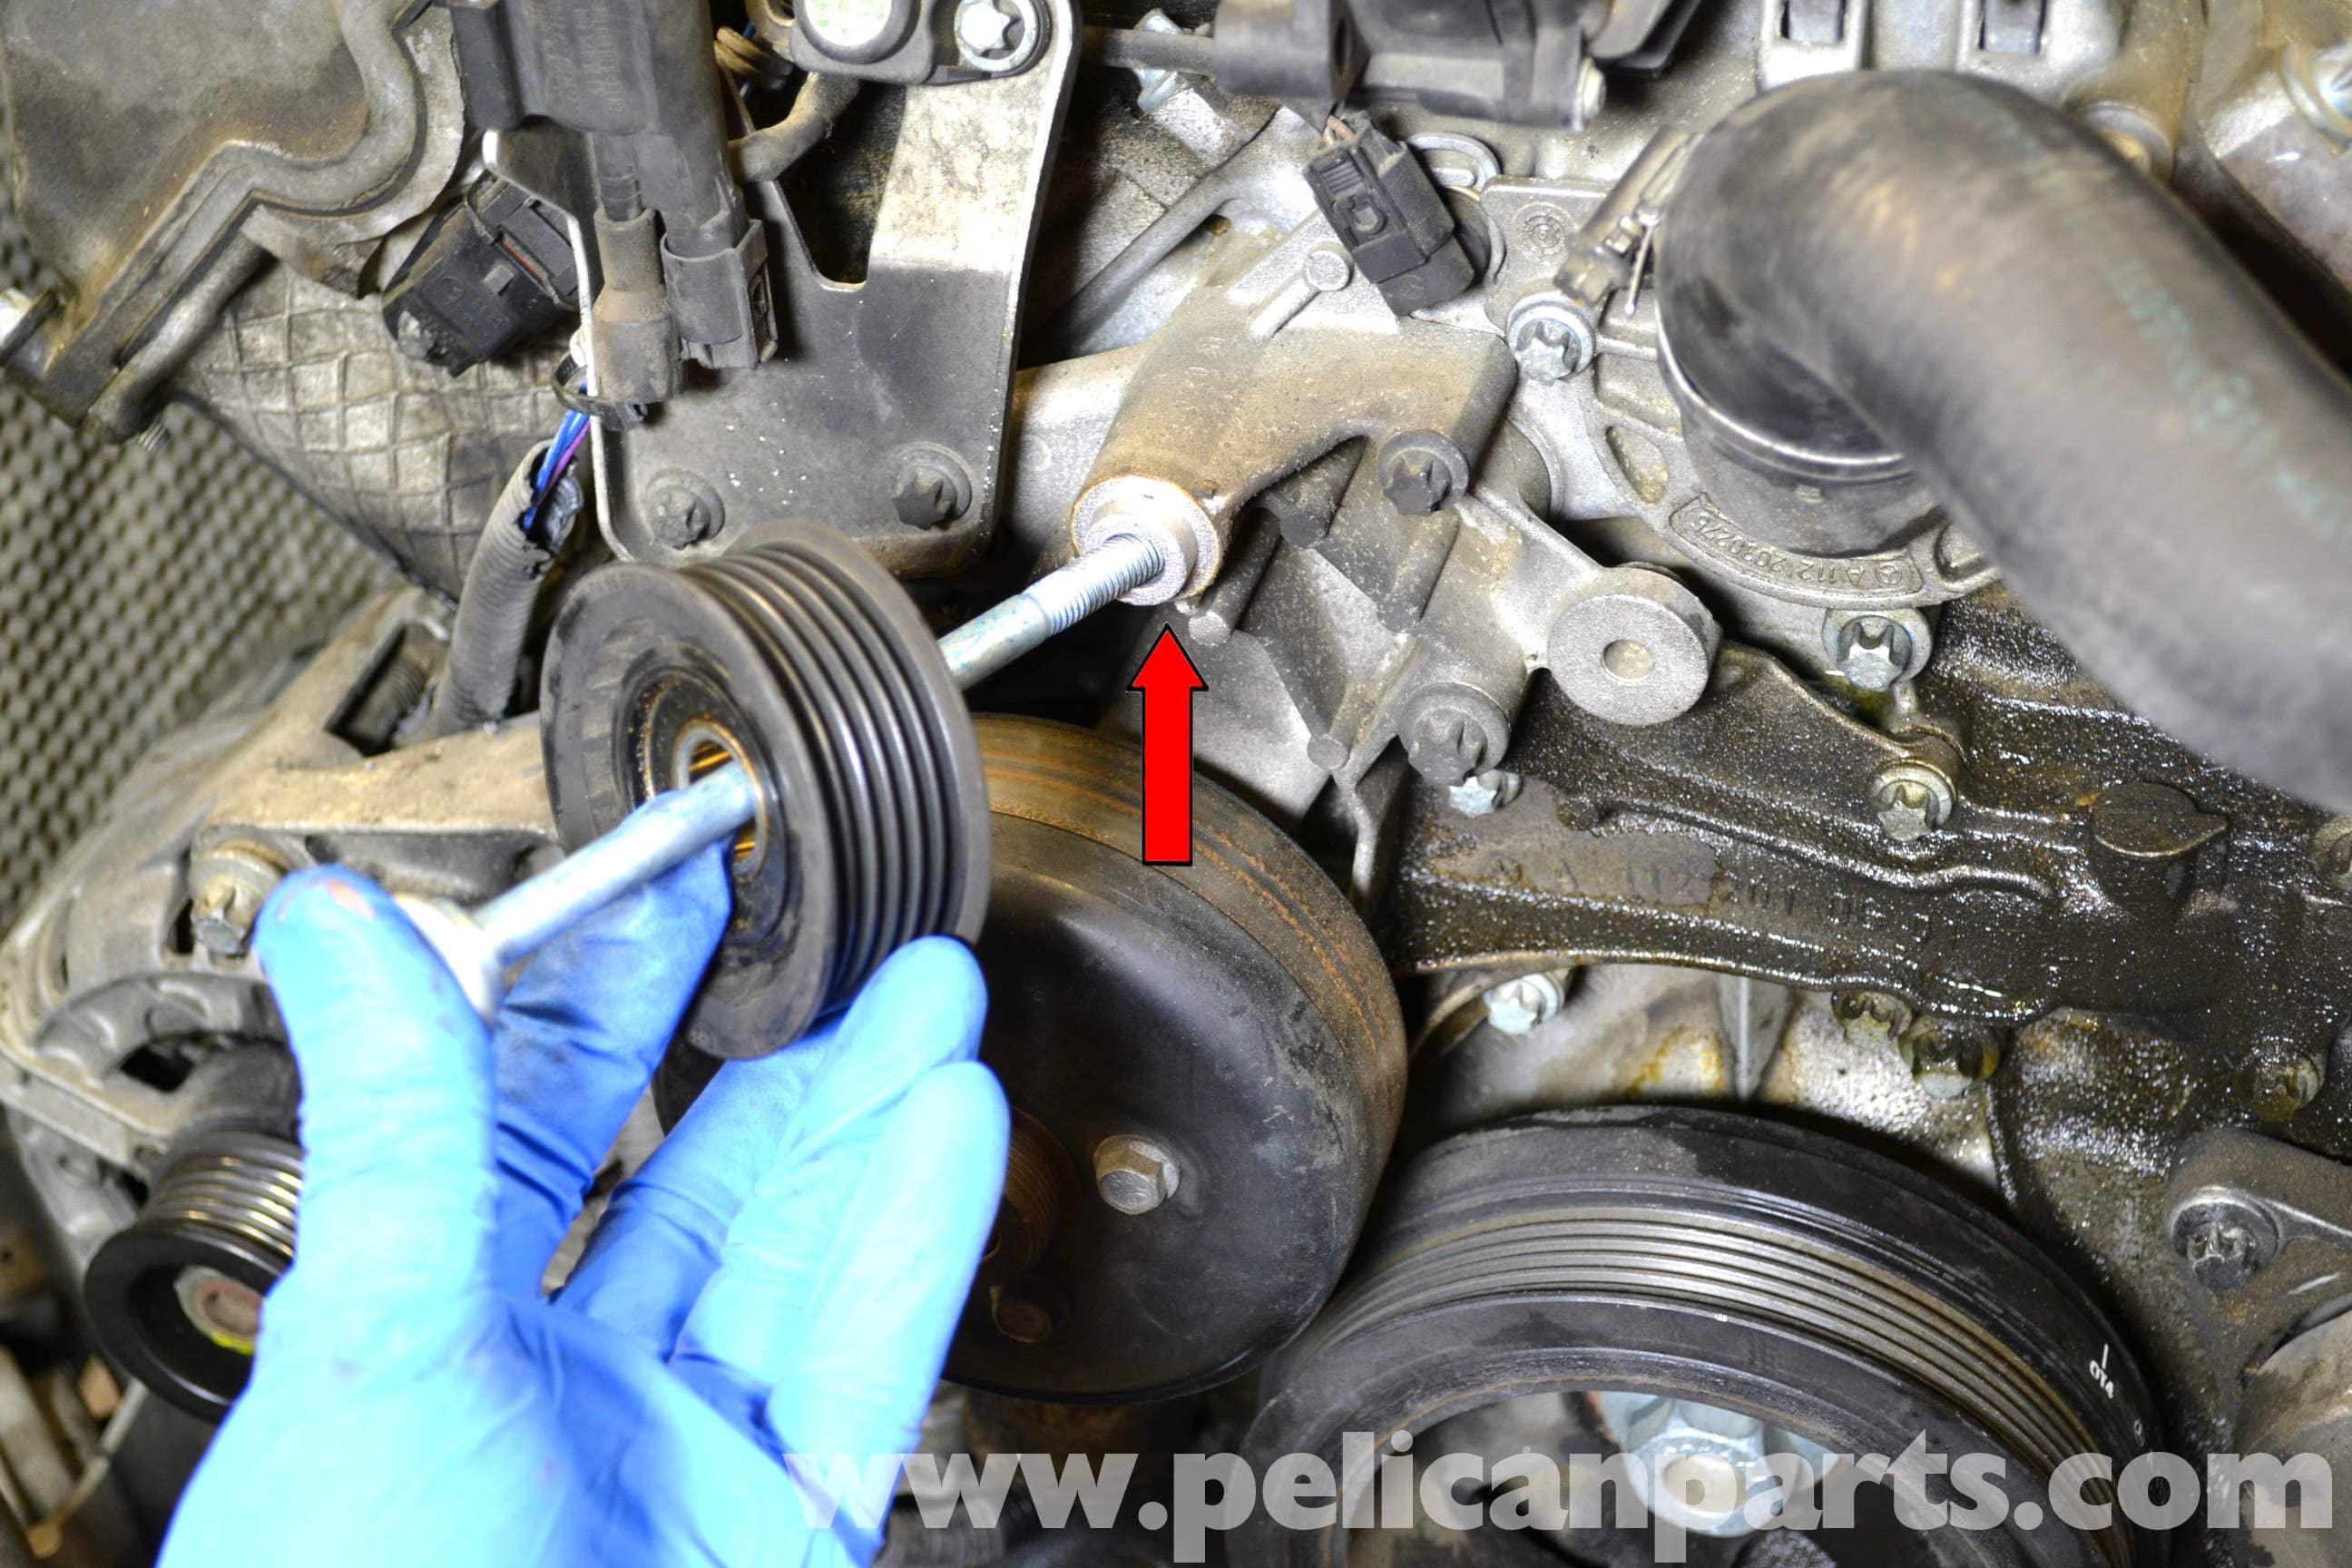 Mercedes-Benz W203 Water Pump Replacement - (2001-2007) C230